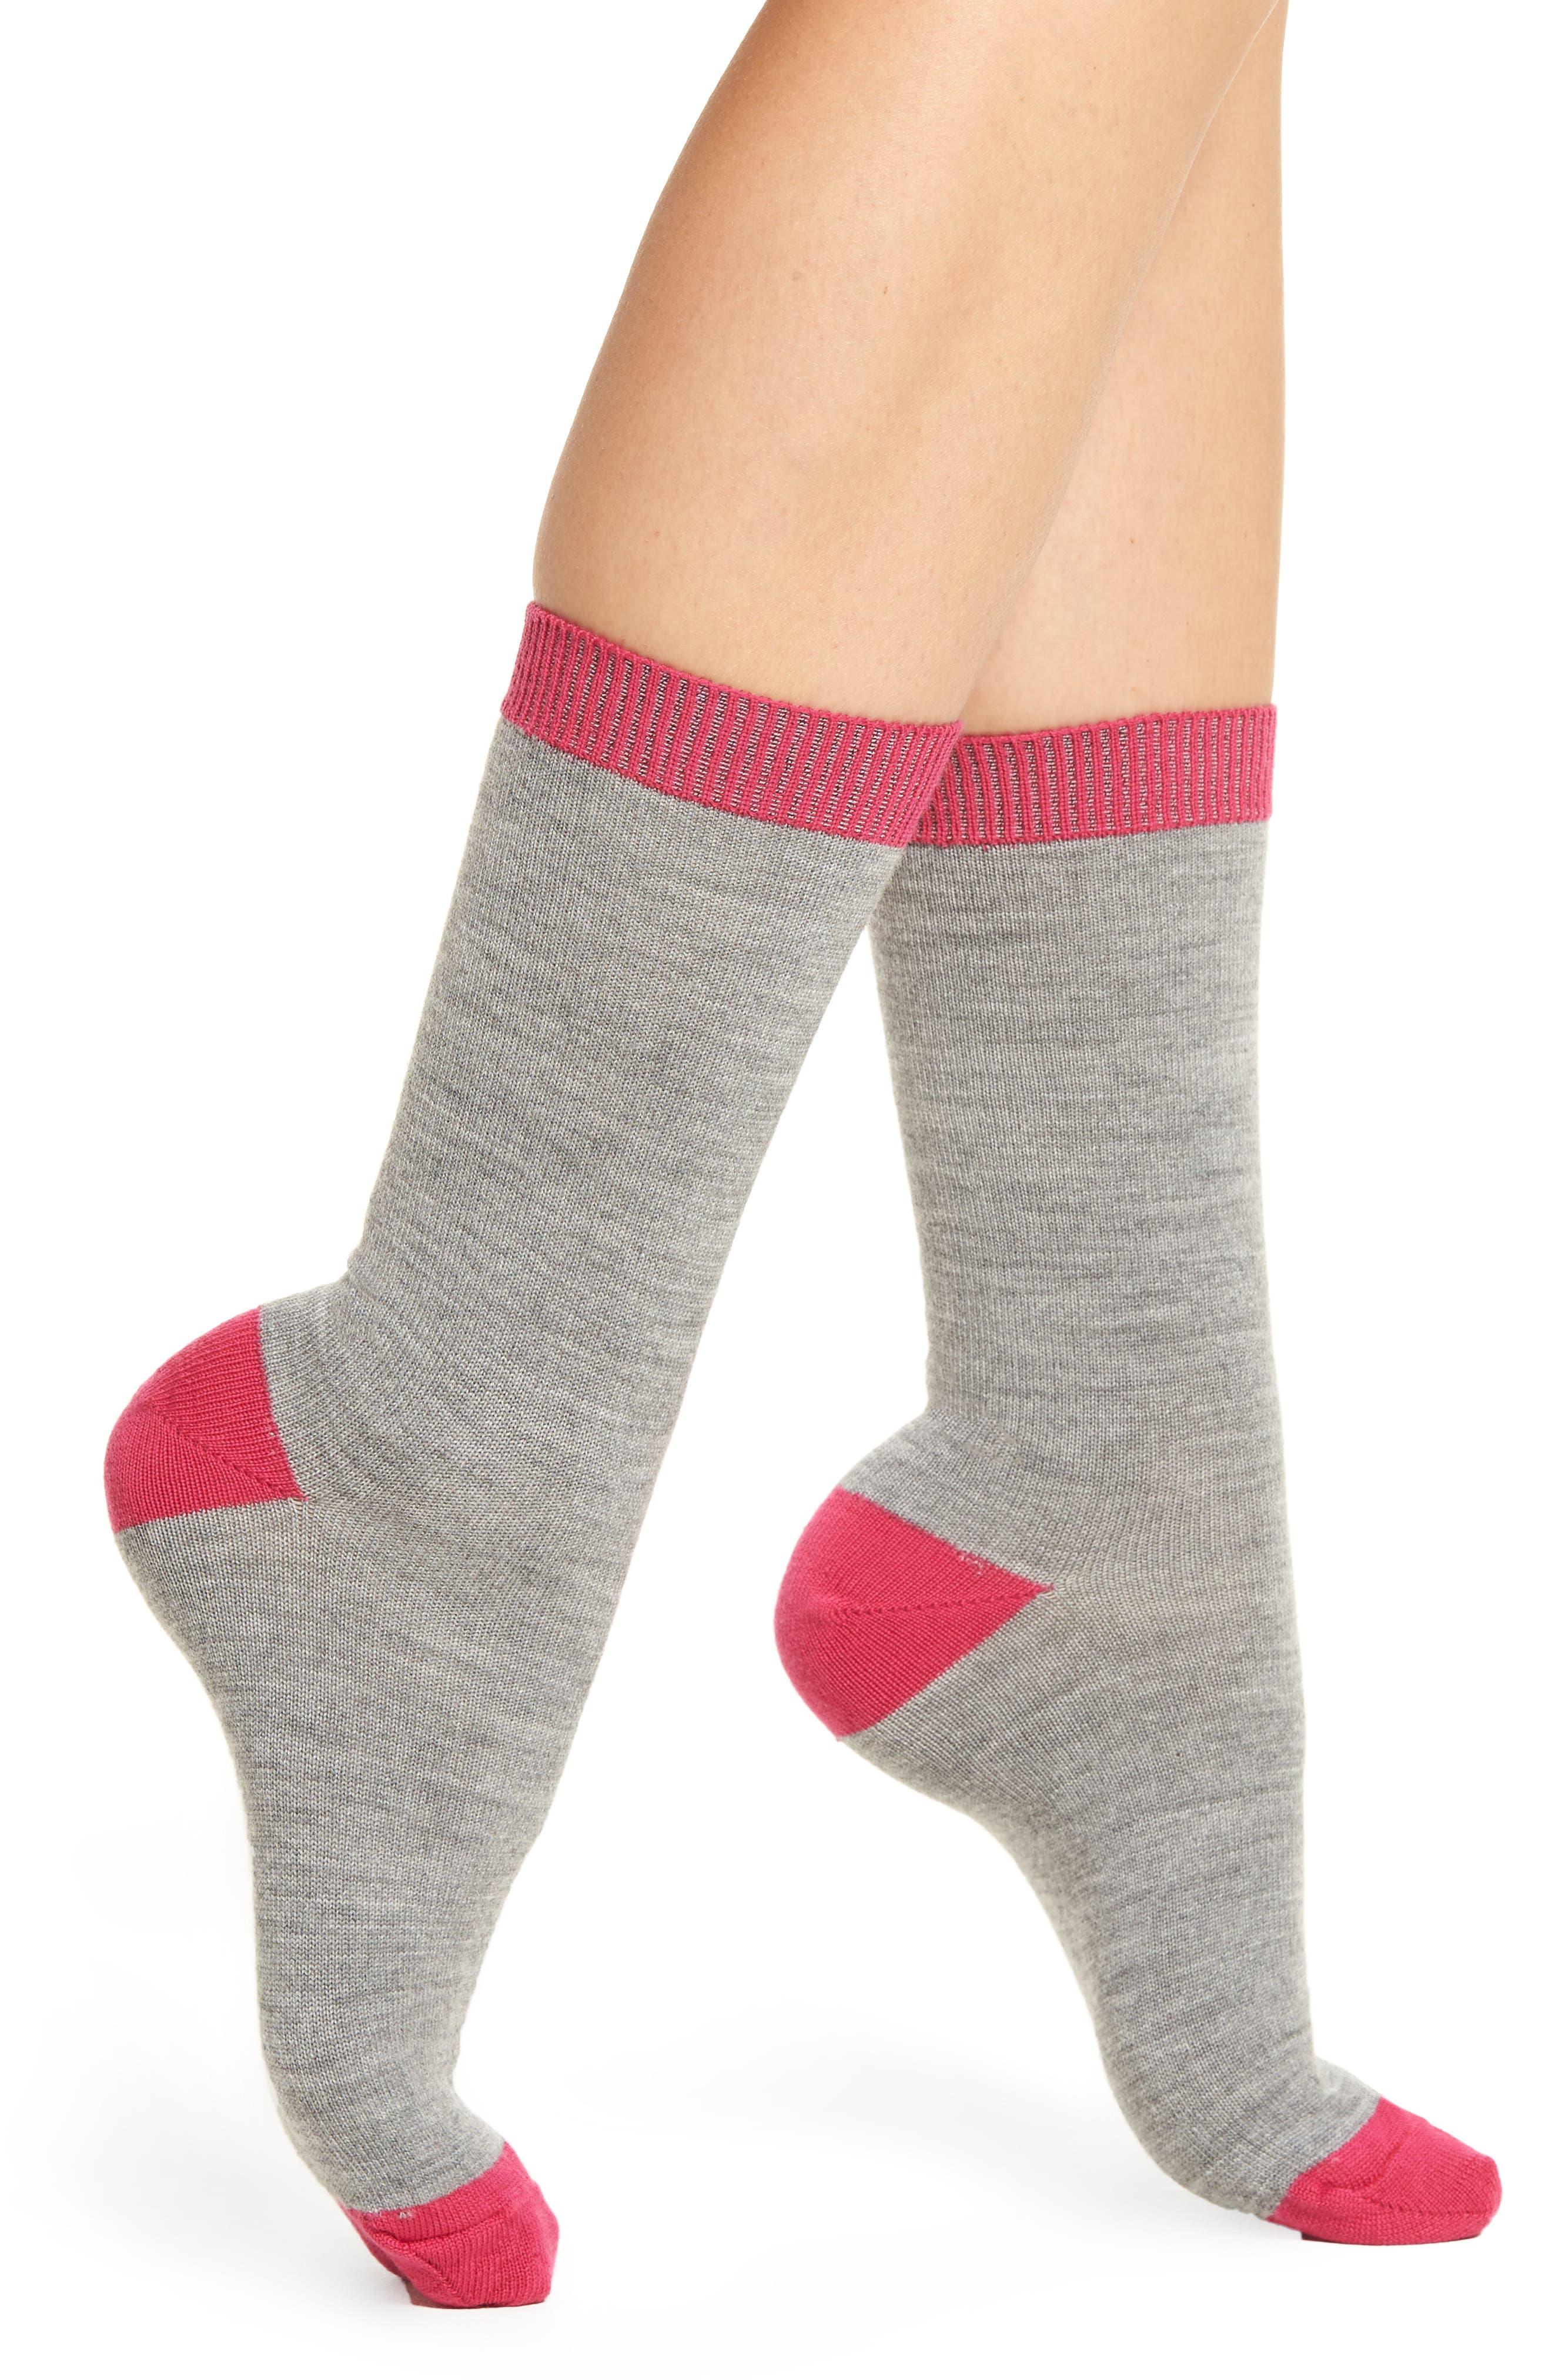 Nordstrom Merino Wool Blend Crew Socks